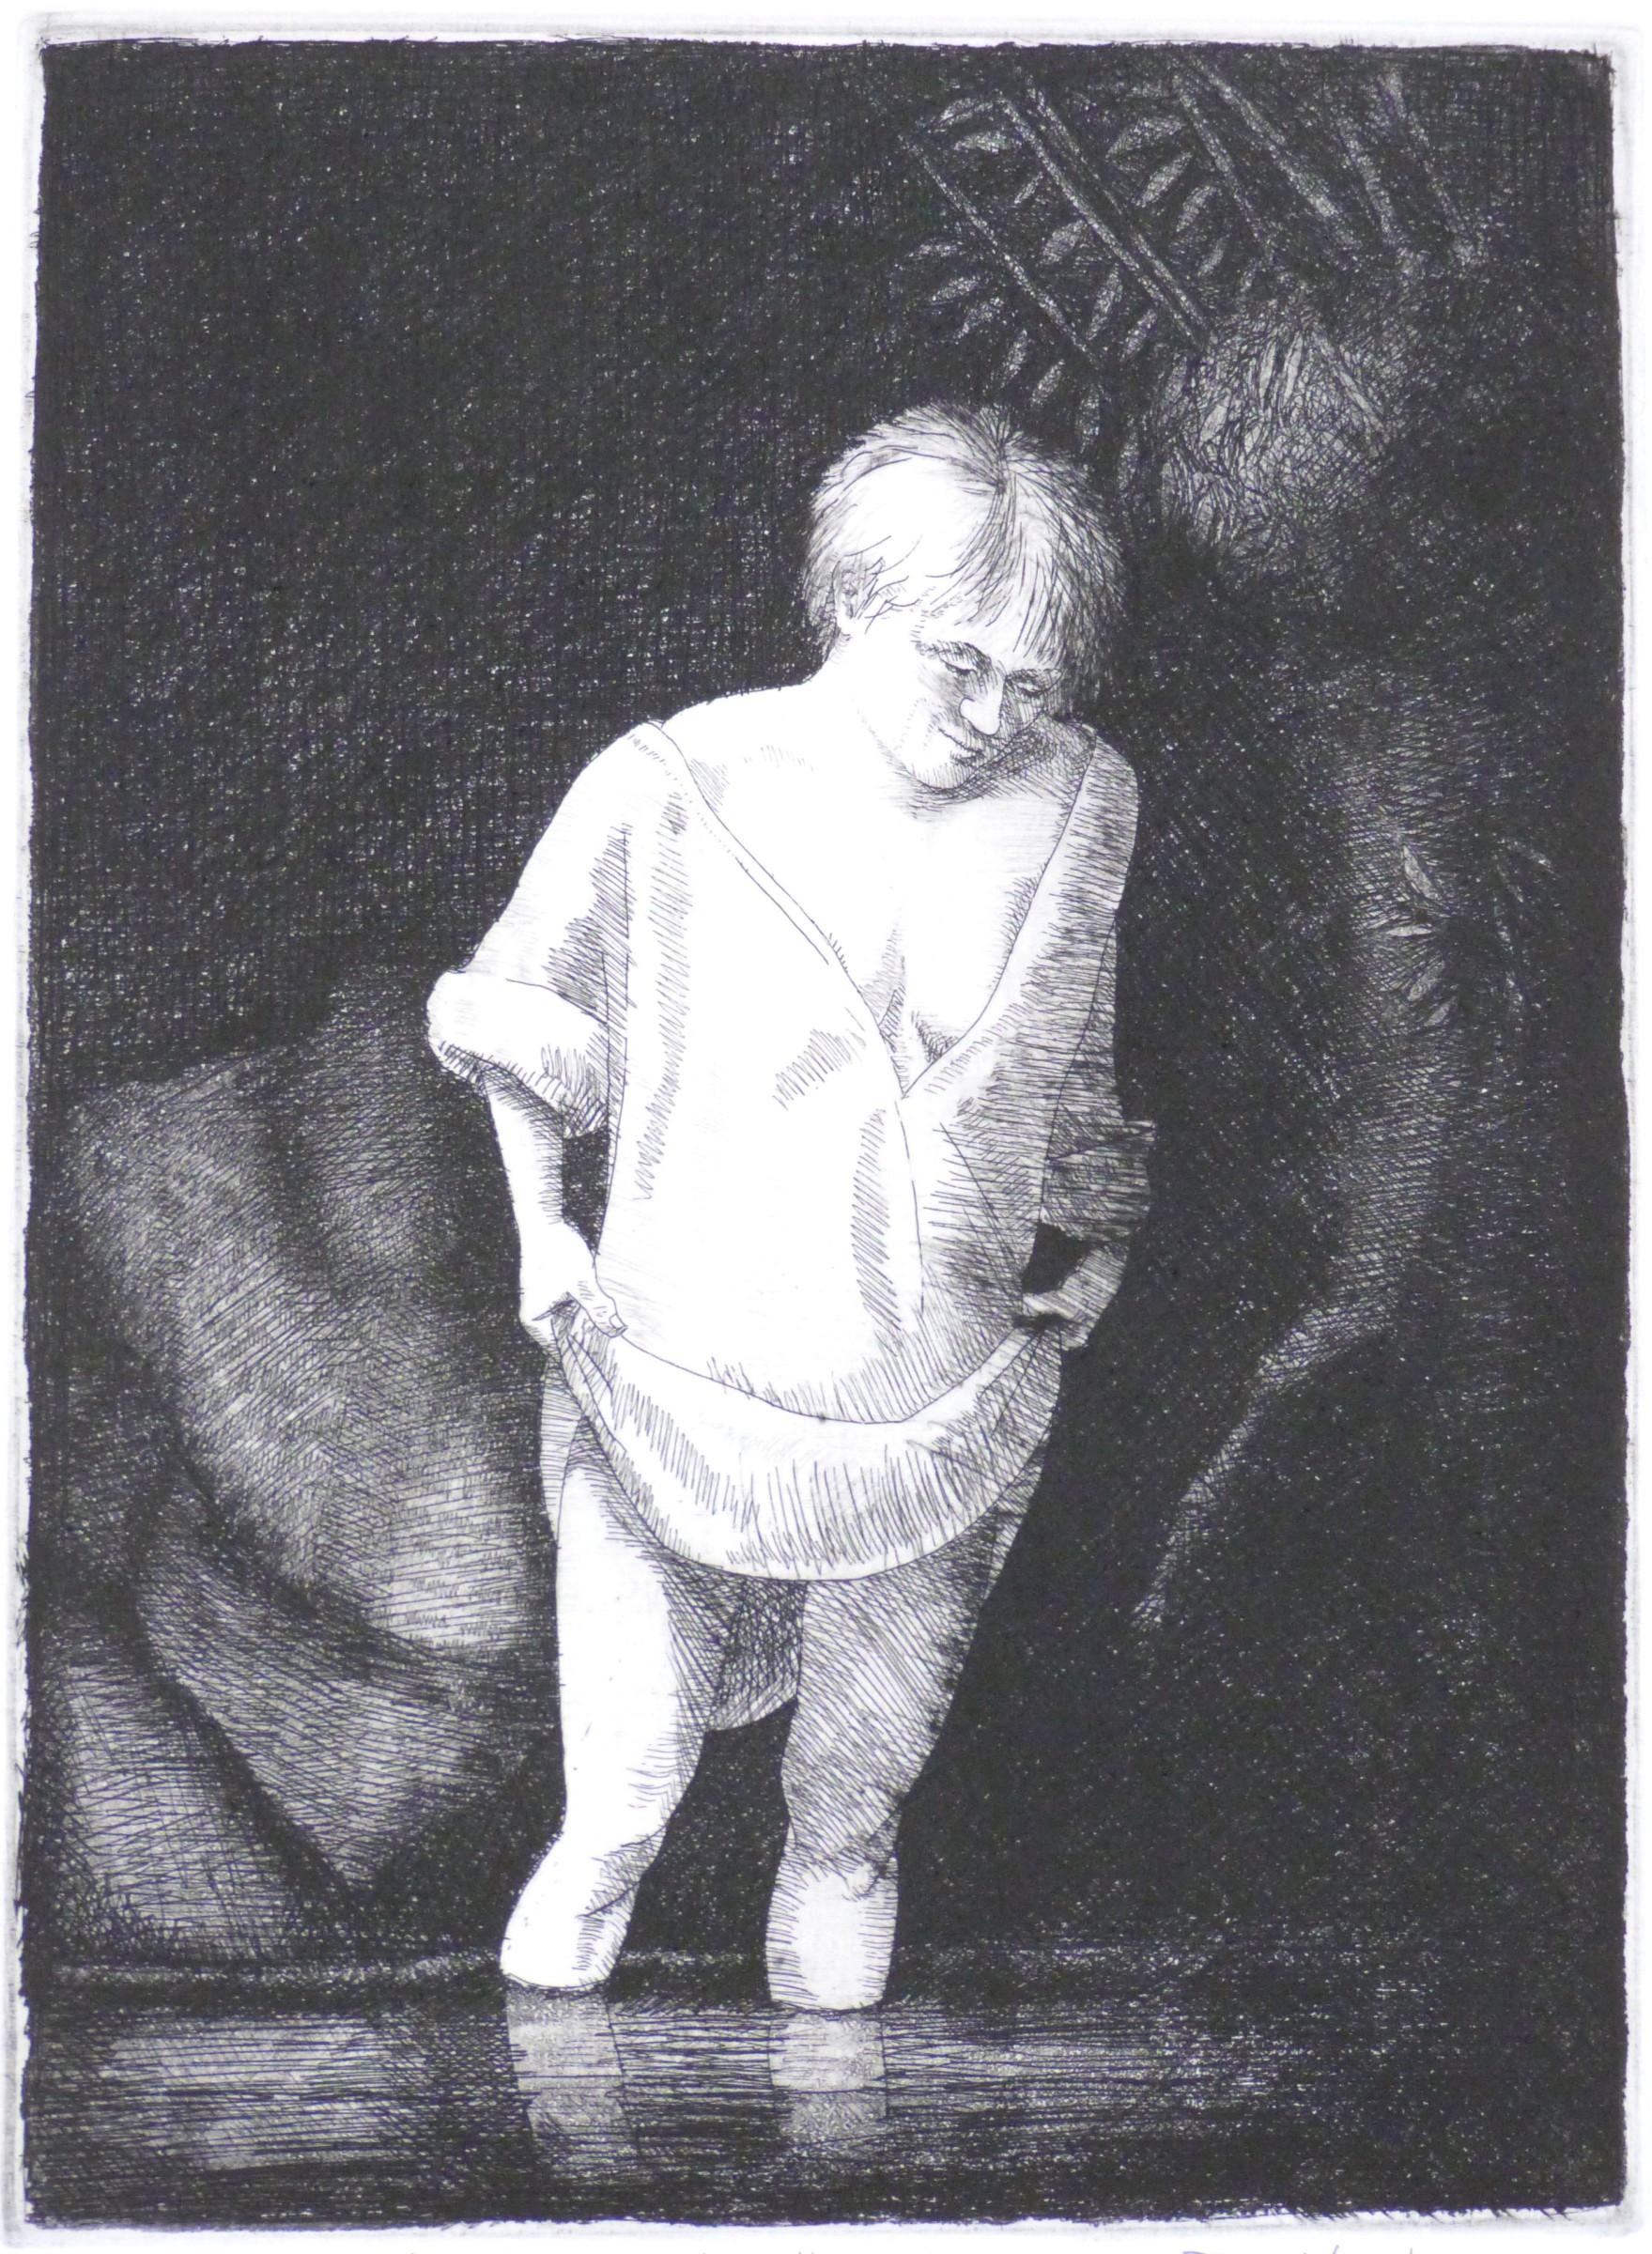 "<span class=""link fancybox-details-link""><a href=""/exhibitions/20/works/artworks_standalone10756/"">View Detail Page</a></span><div class=""artist""><span class=""artist""><strong>Frans Wesselman RE</strong></span></div><div class=""title""><em>After Rembrandt, Hazel Bathing</em></div><div class=""medium"">etching<br></div><div class=""dimensions"">26 x 19 cm image size</div><div class=""edition_details"">edition of 15 </div>"